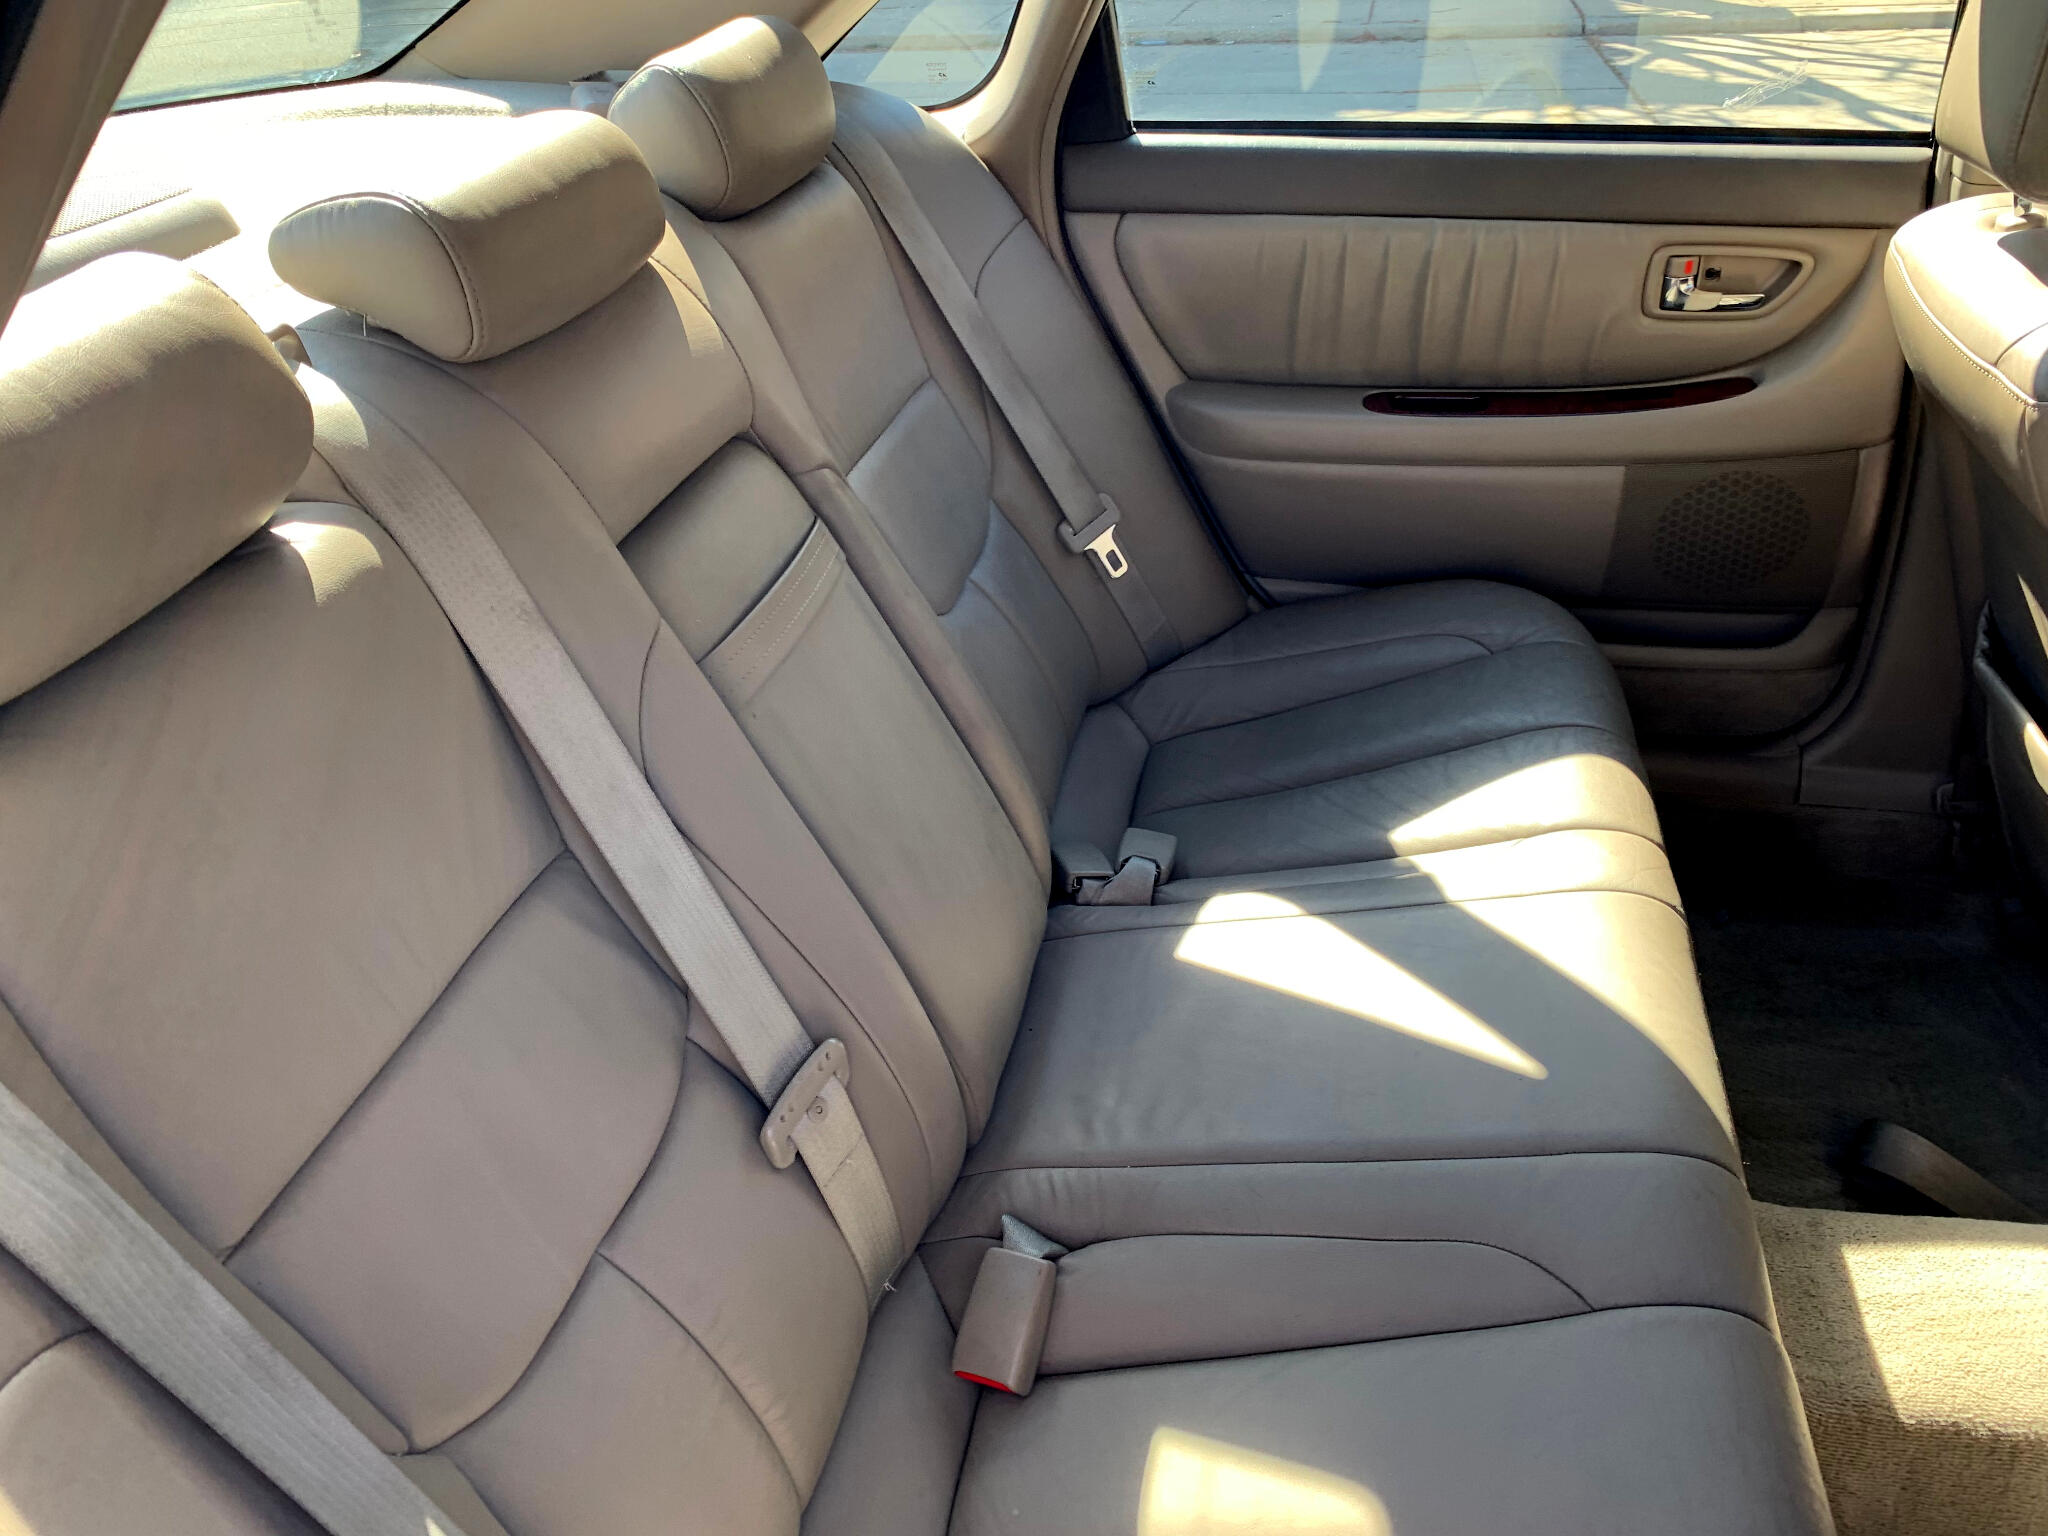 2002 Toyota Avalon 4dr Sdn XLS w/Bench Seat (Natl)